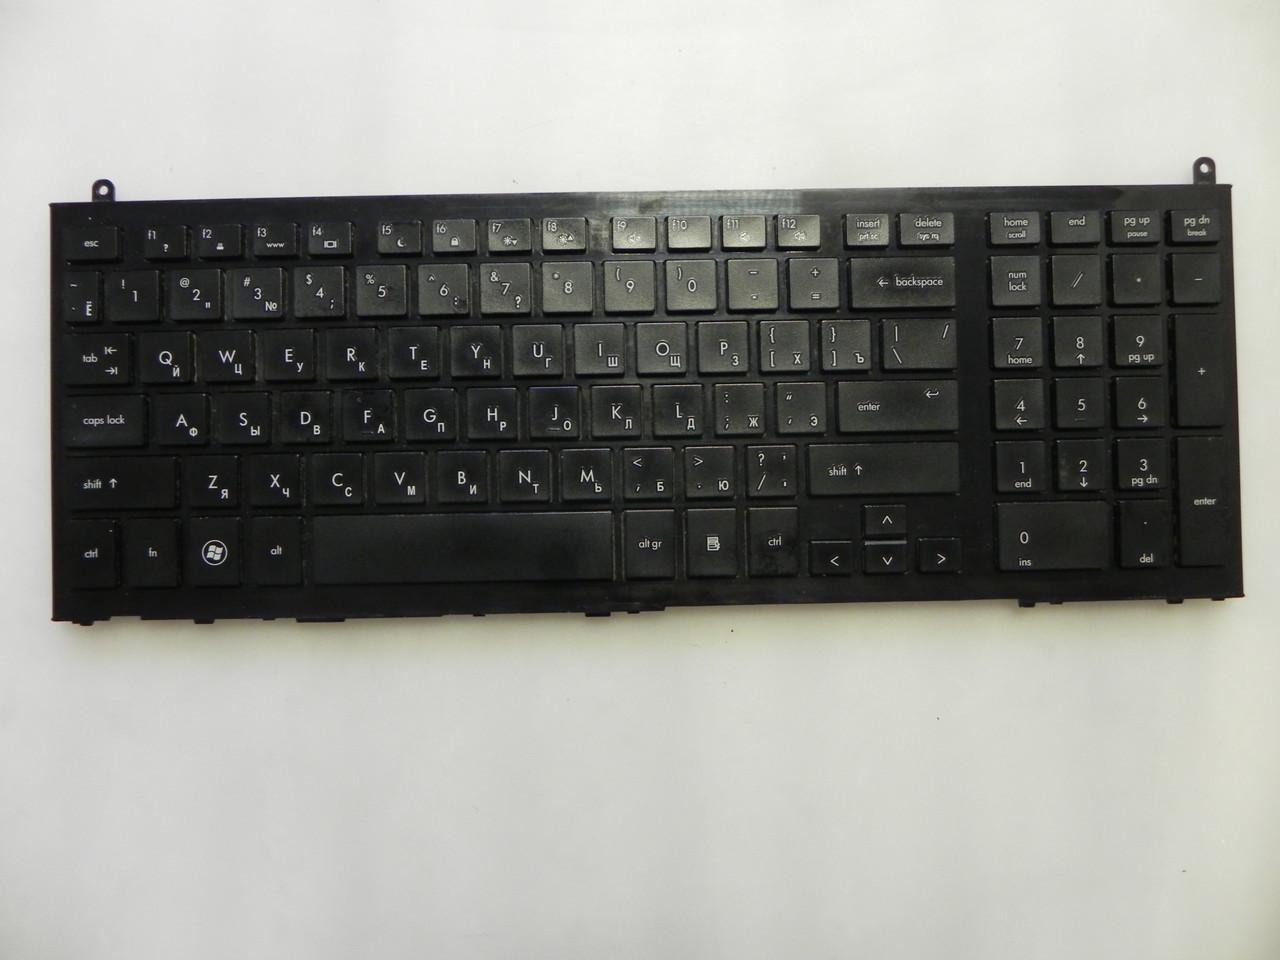 Клавиатура оригинальная с рамкой HP Probook 4510S, 4710S, 4750S, 4510S, 4515 бу